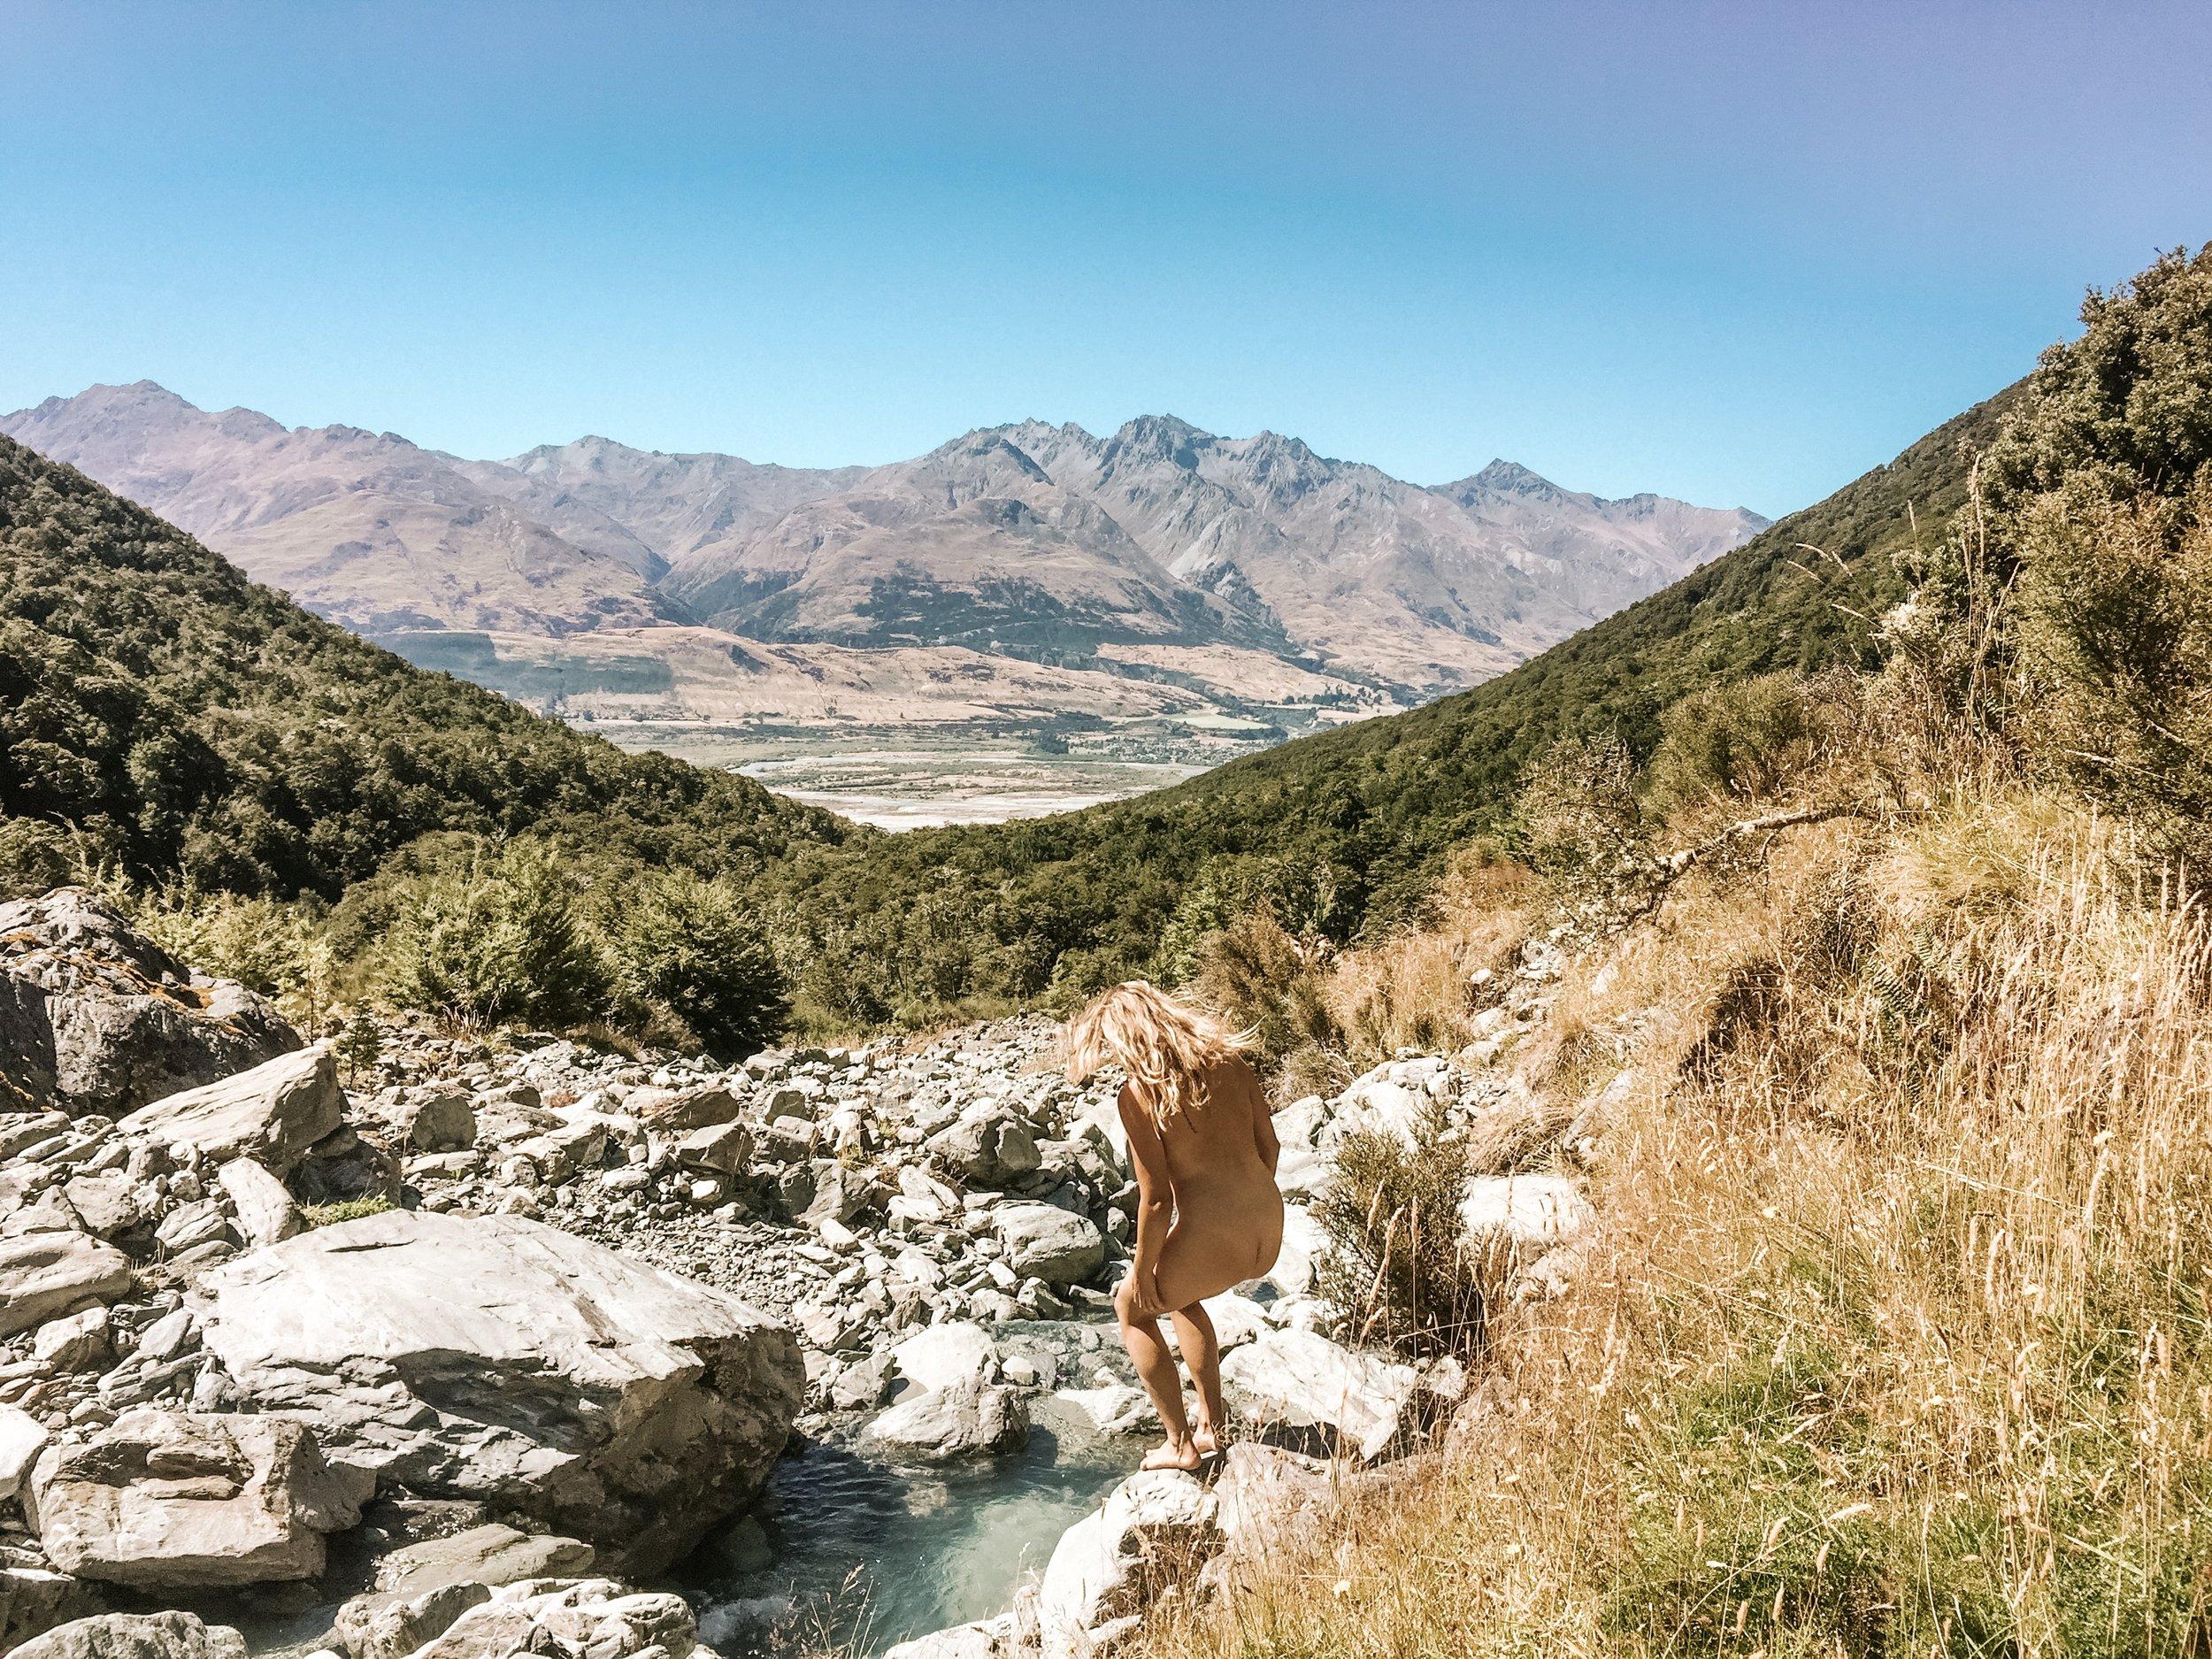 Having a refreshing dip post-steep climb up the Glacier Burn Track